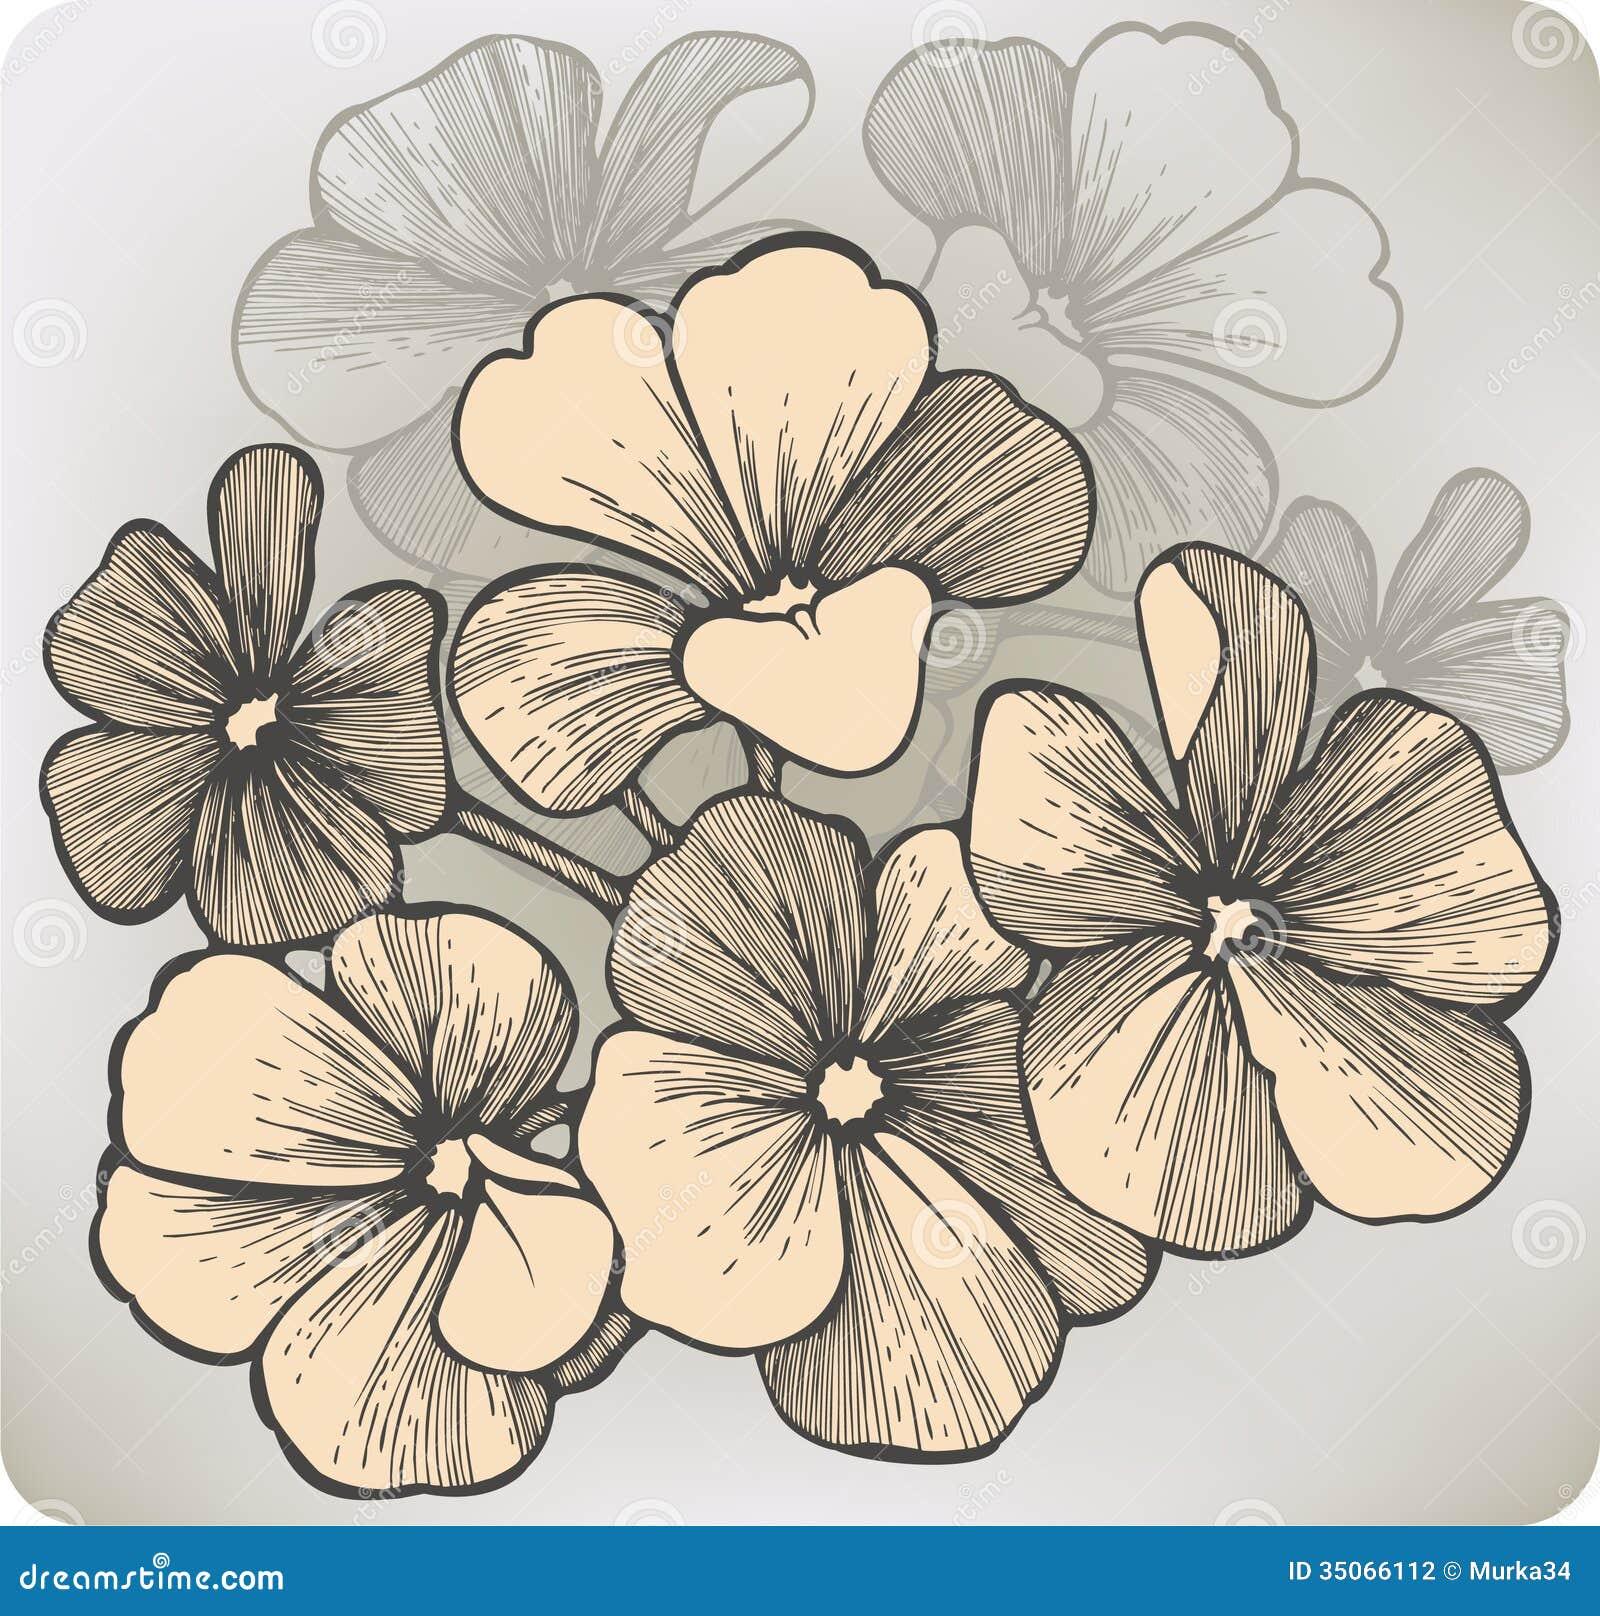 geranium flower drawing - photo #15